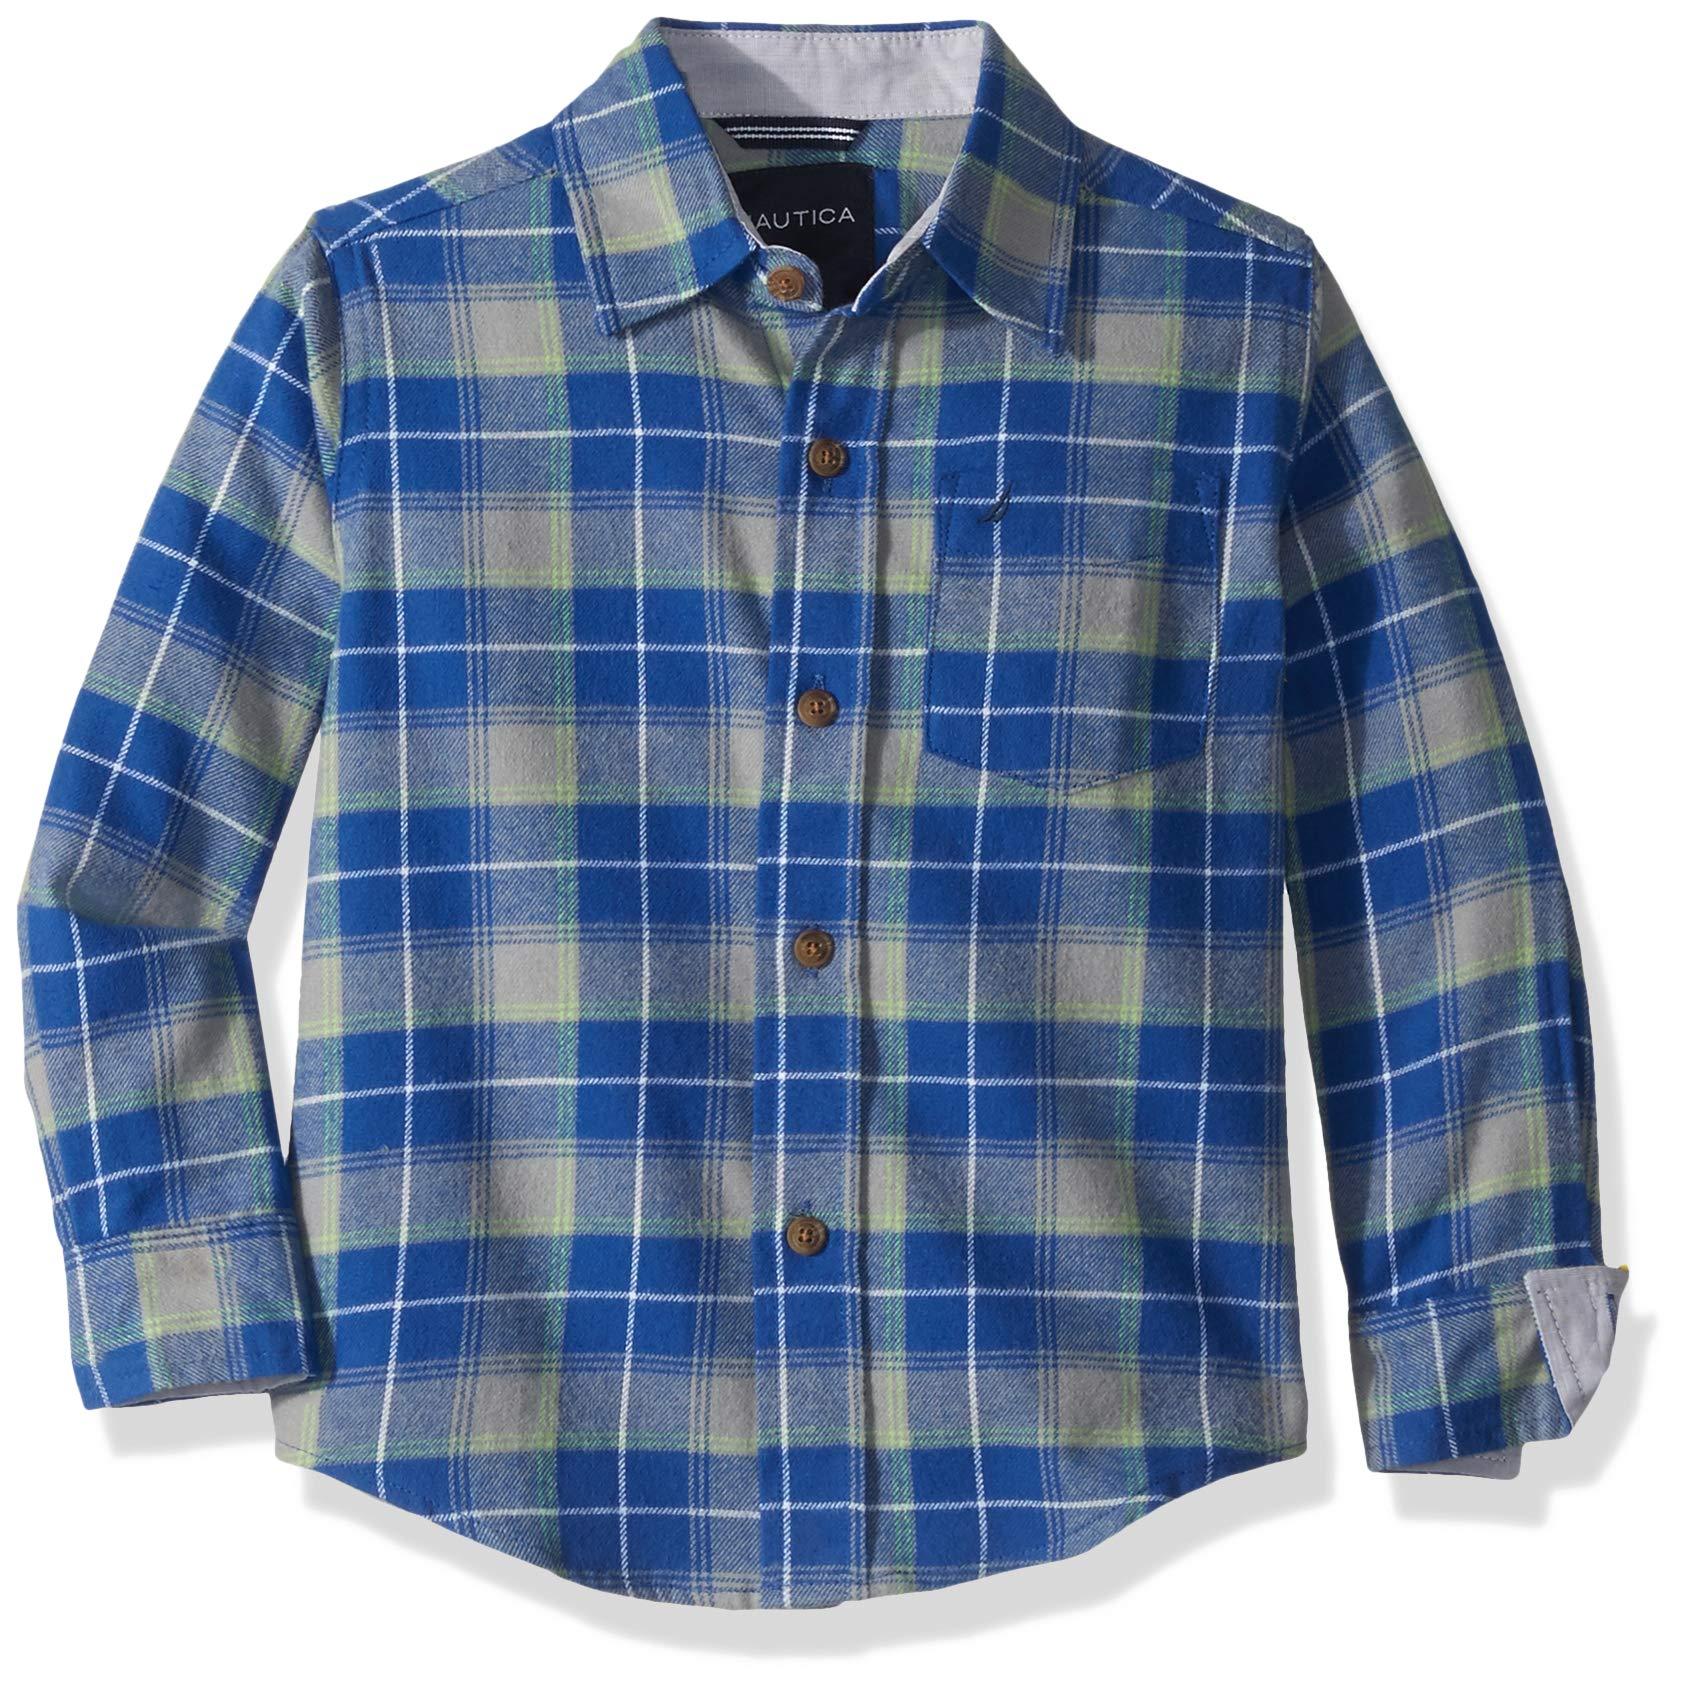 Nautica Boys' Long Sleeve Flannel Woven Shirt, Evans Cobalt, X-Large (18/20)